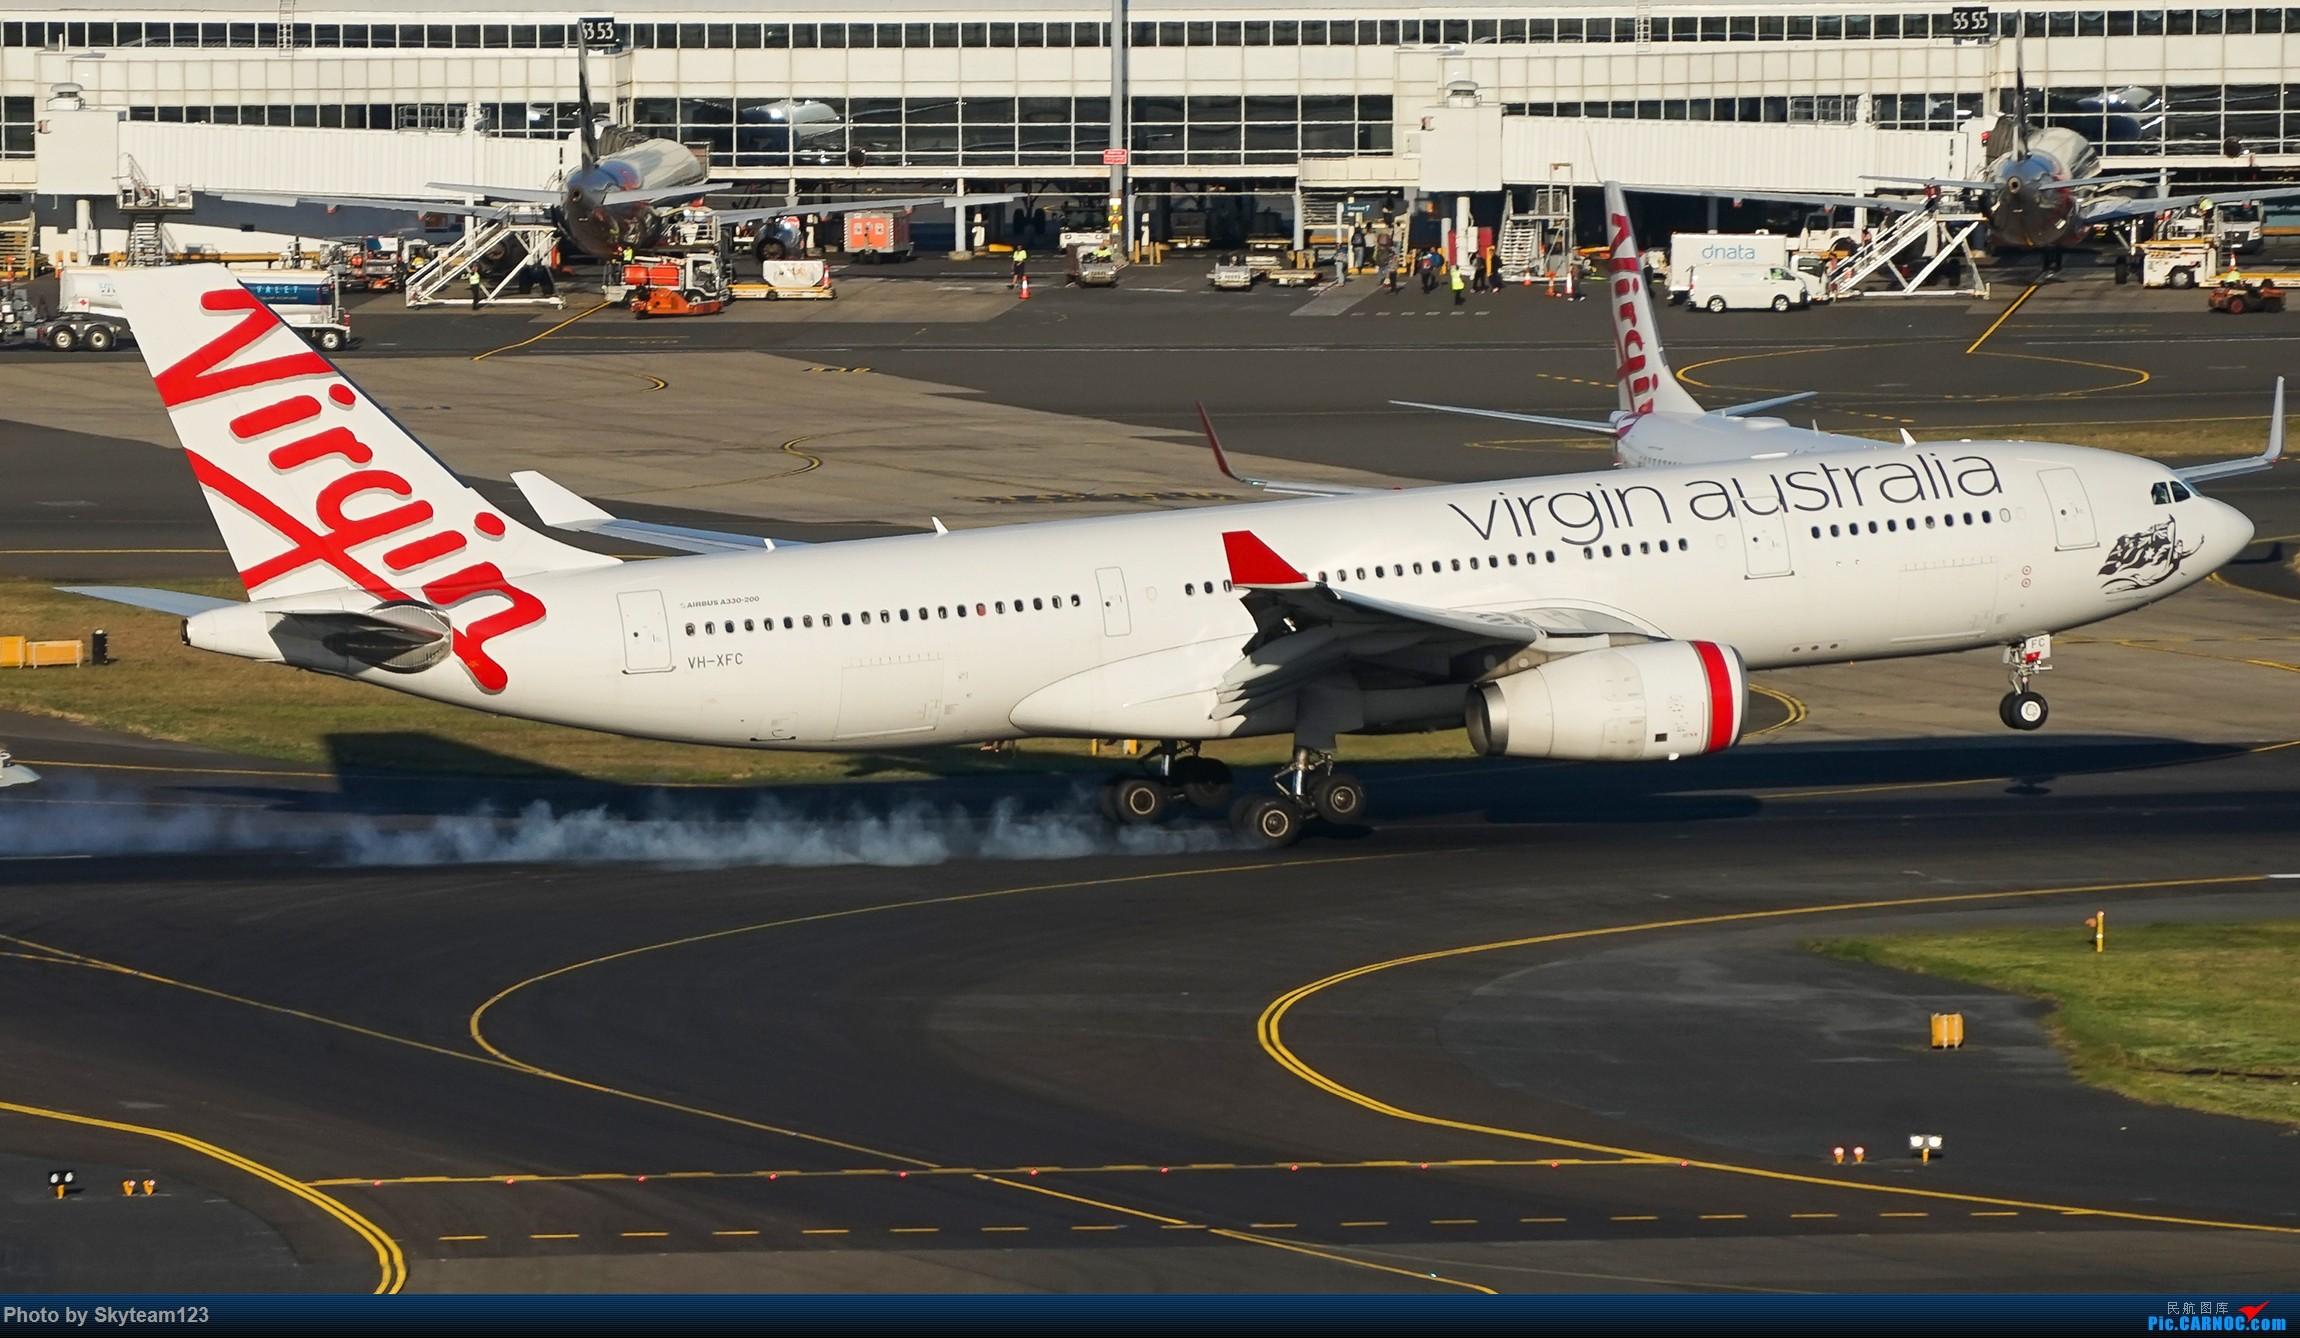 Re:[原创][SYD] 假期拍机小结 解锁16R跑道头拍机位 & 停车楼拍机作业 【全宽体】 AIRBUS A330-200 VH-XFC 澳大利亚悉尼金斯福德·史密斯机场